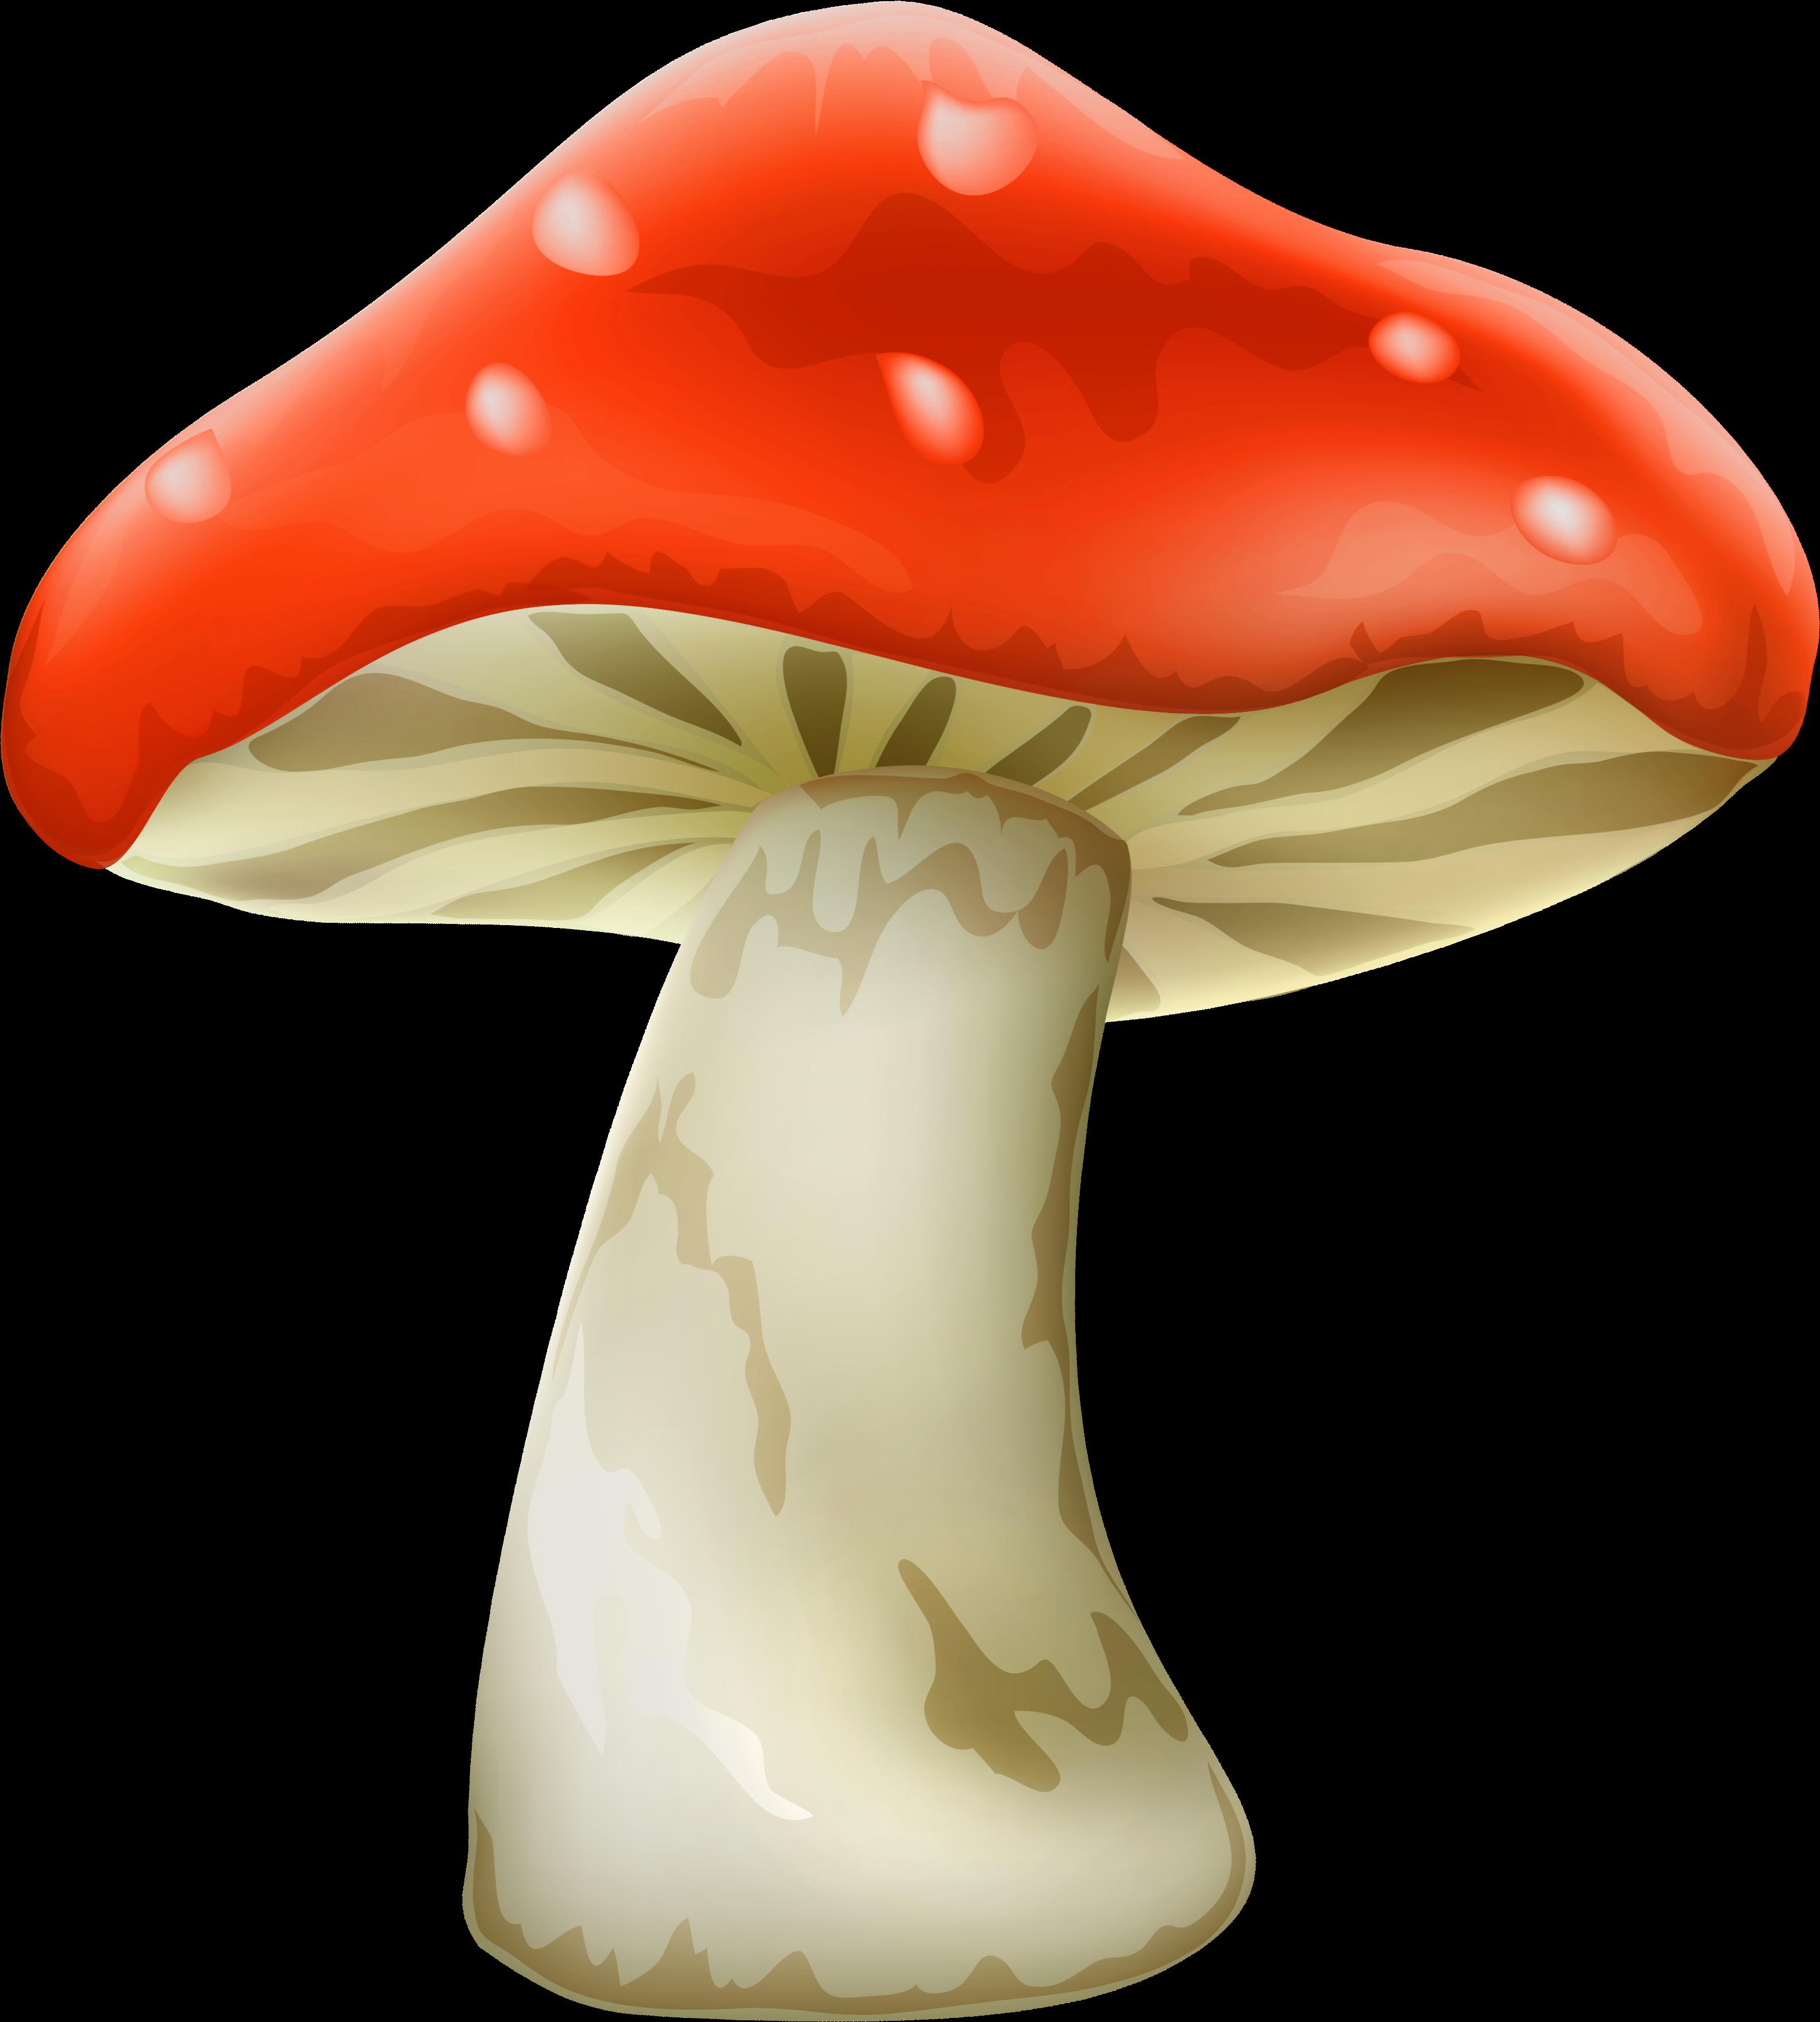 Mushroom Vector Alice In Wonderland.